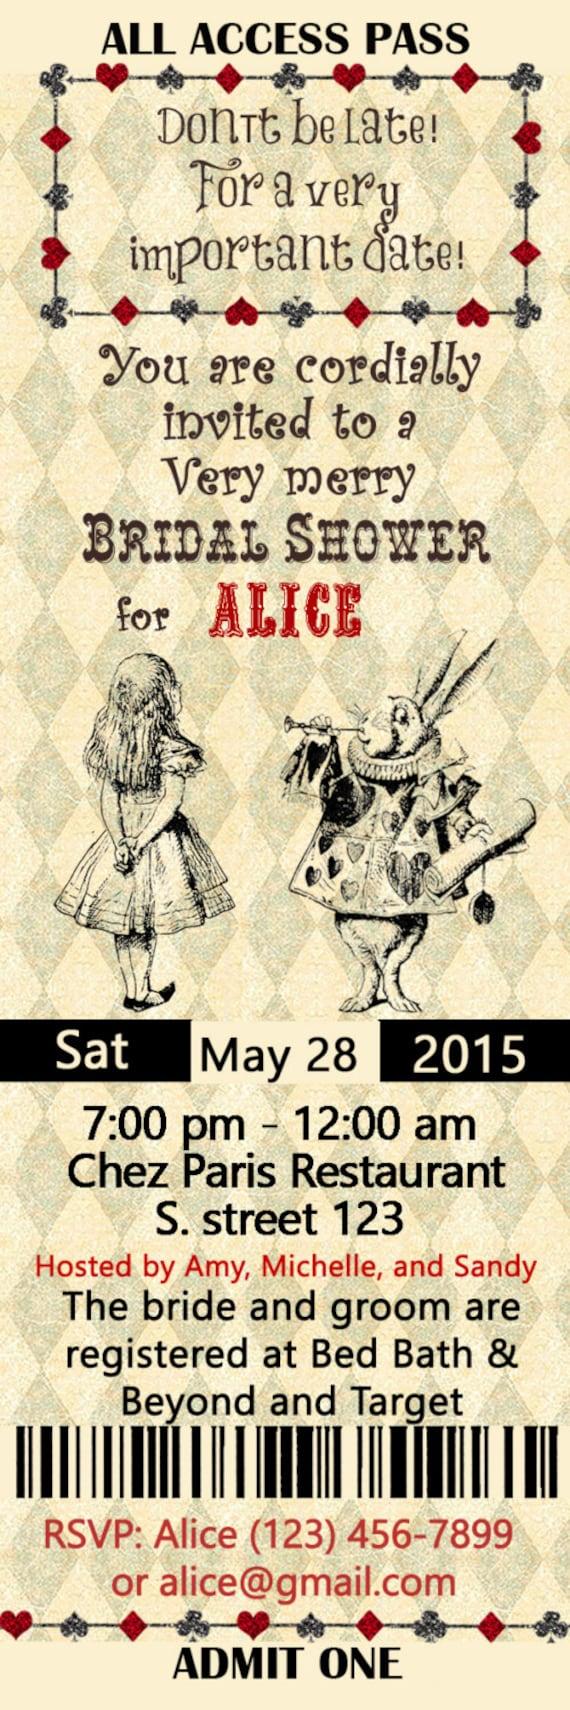 Alice in Wonderland Bridal Shower Invitation Ticket style | Etsy